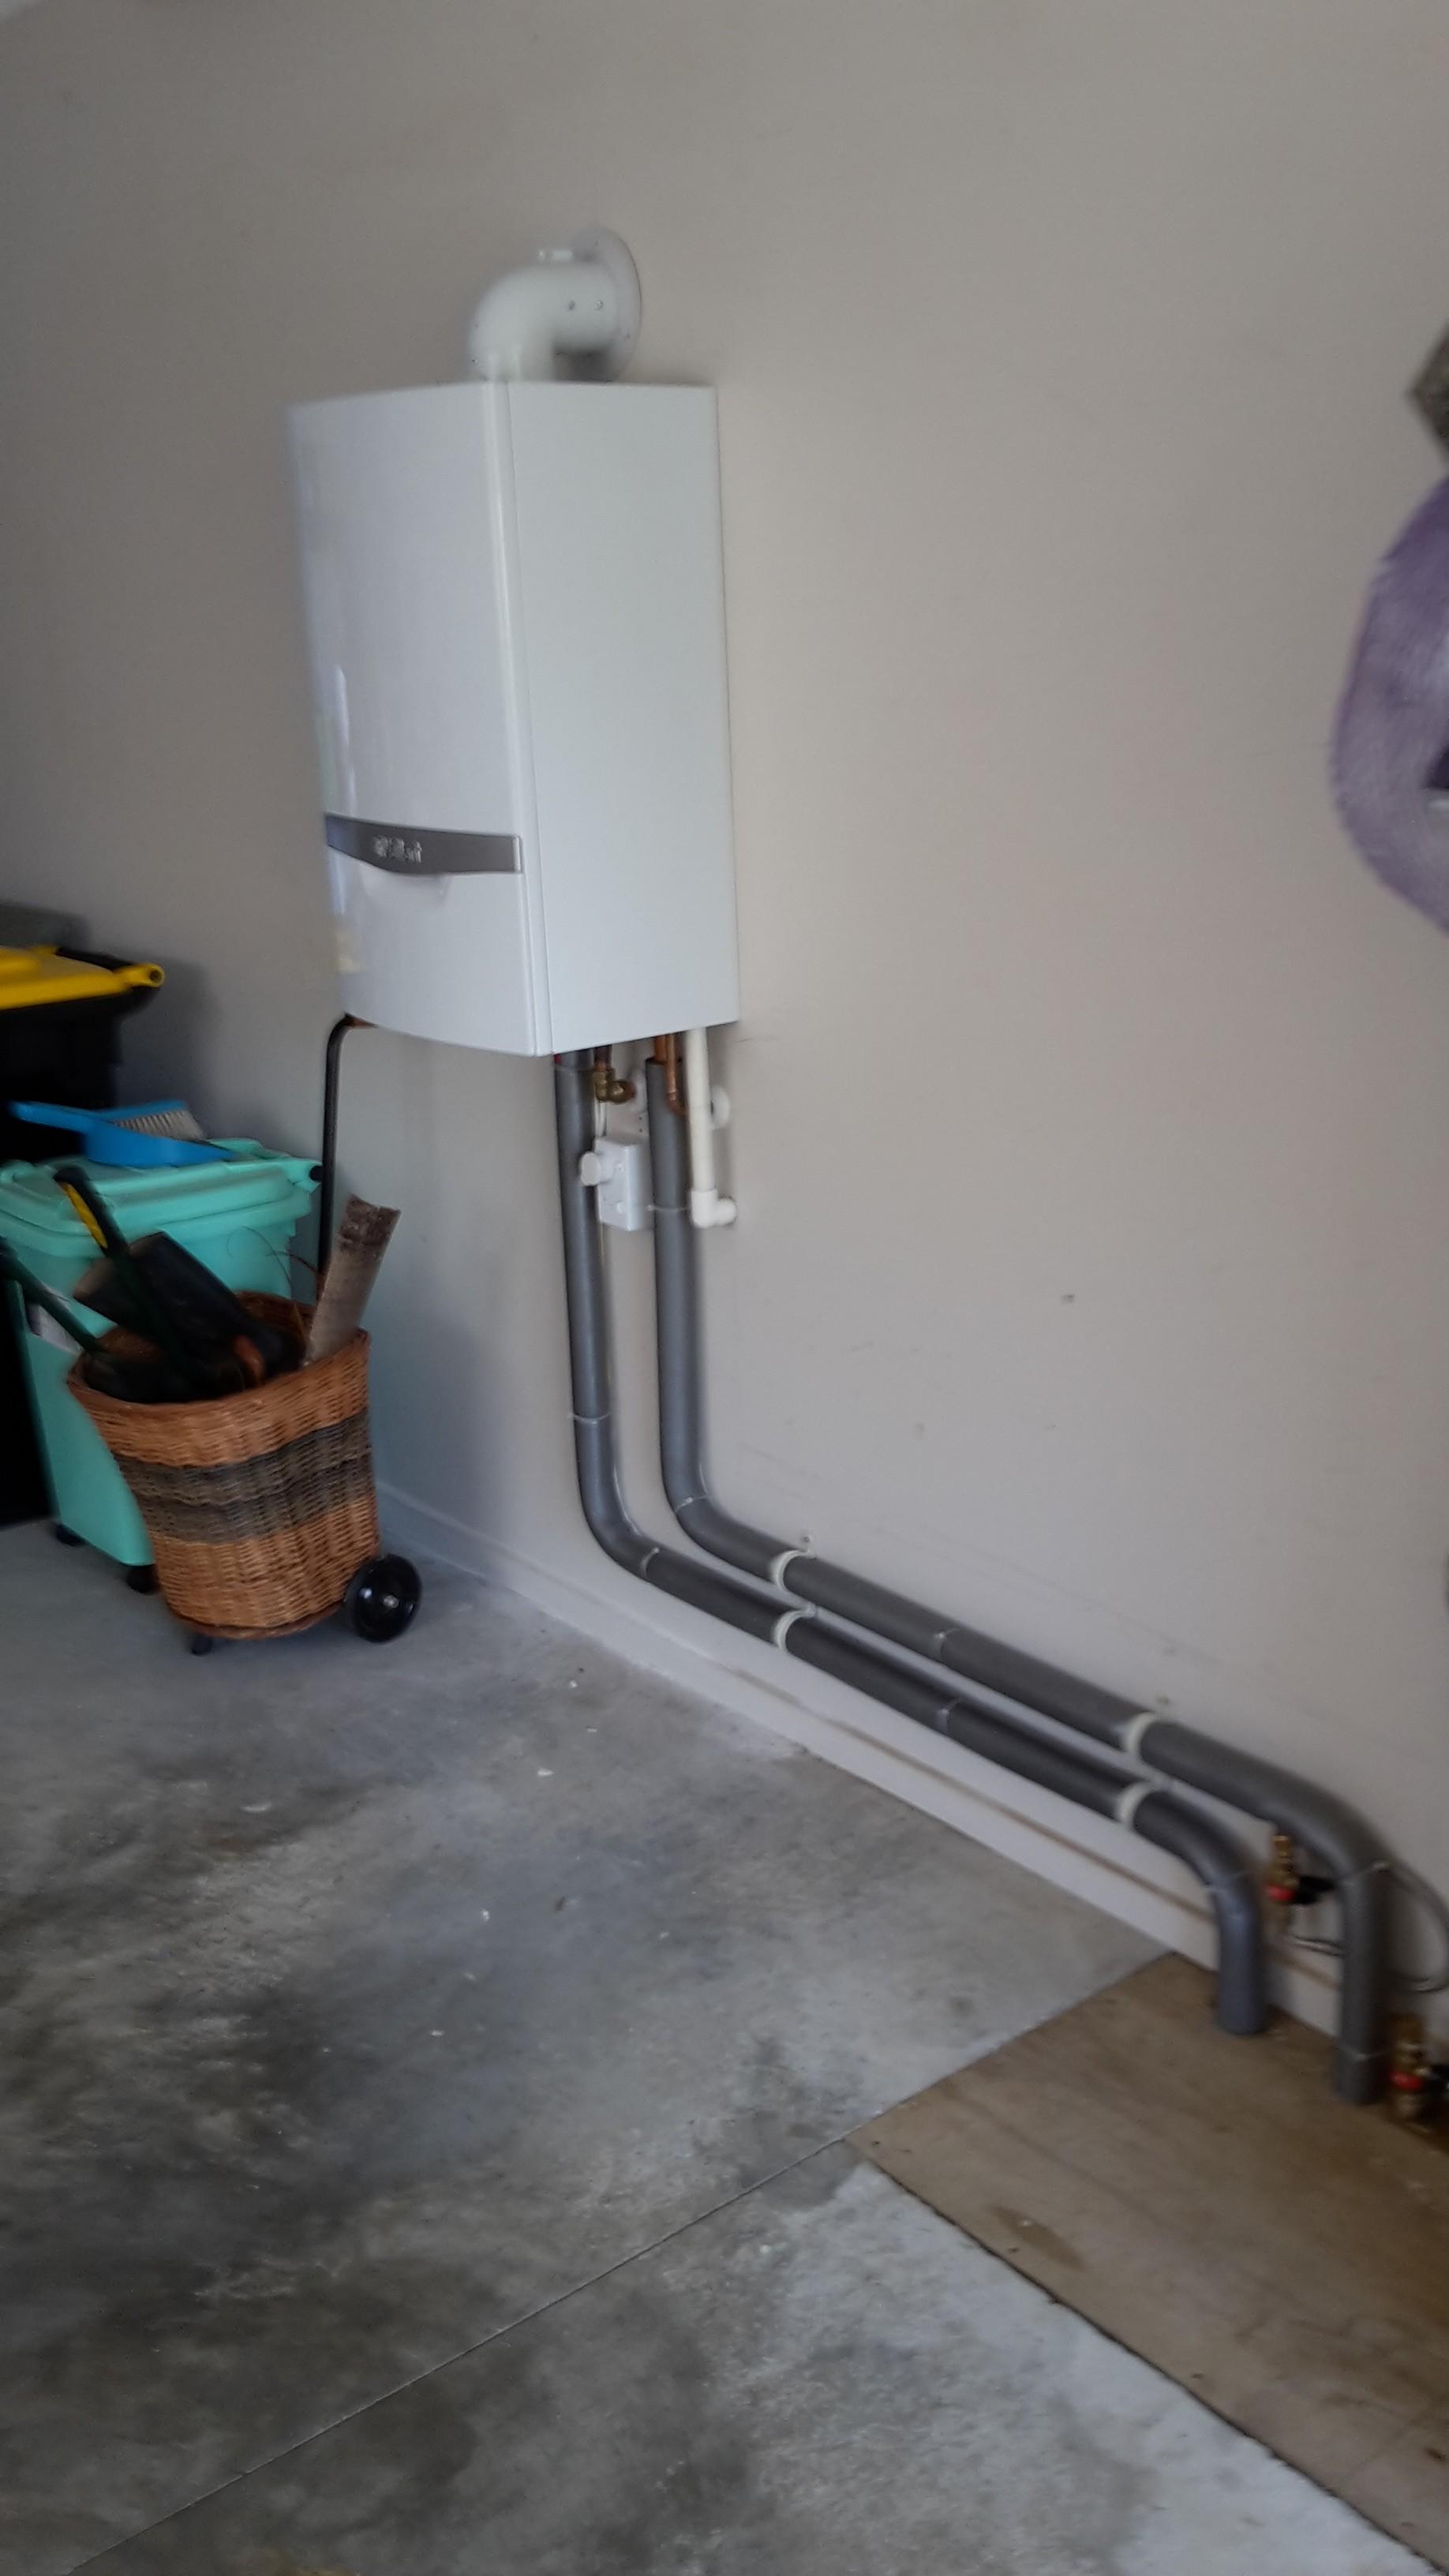 Boiler placed in garage